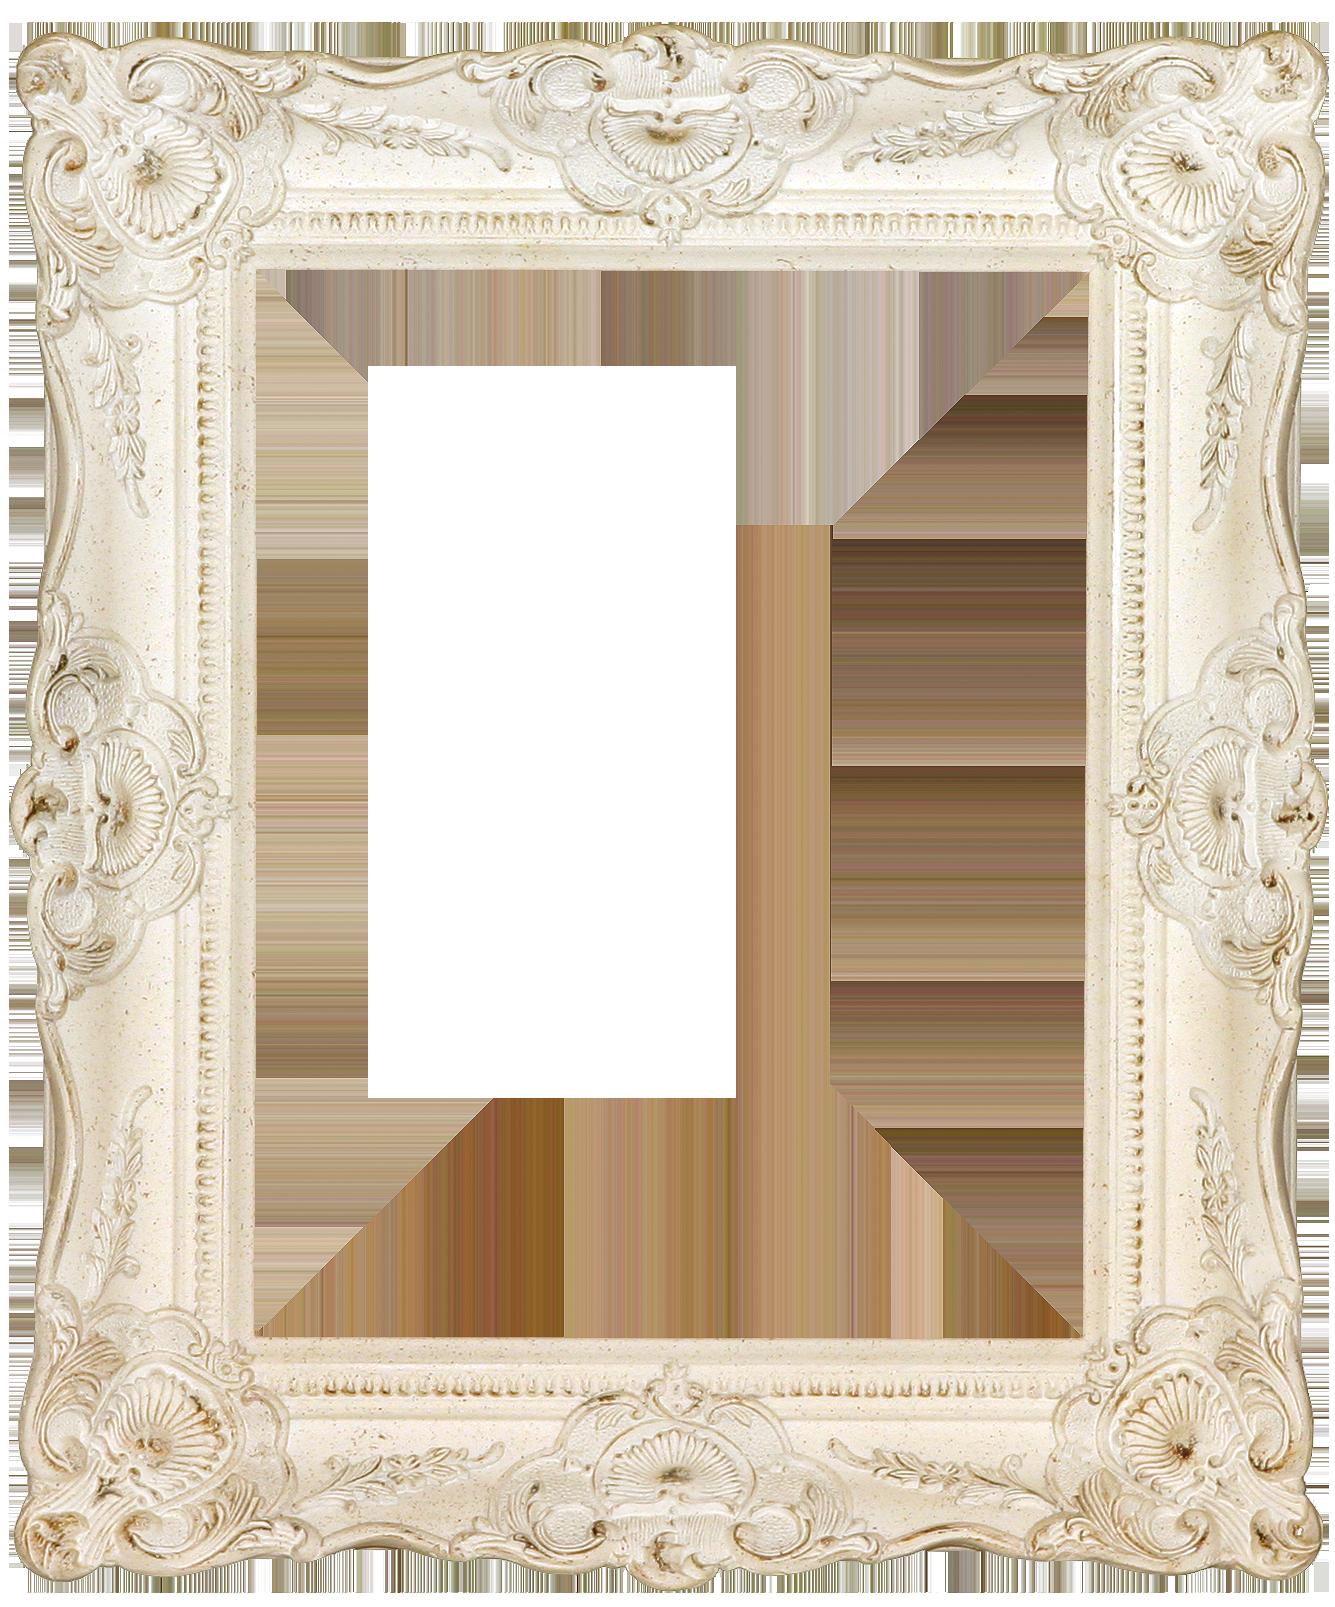 511 Zoom Png 1335 1607 Www Kendallhartcraft Com Readymade Frame